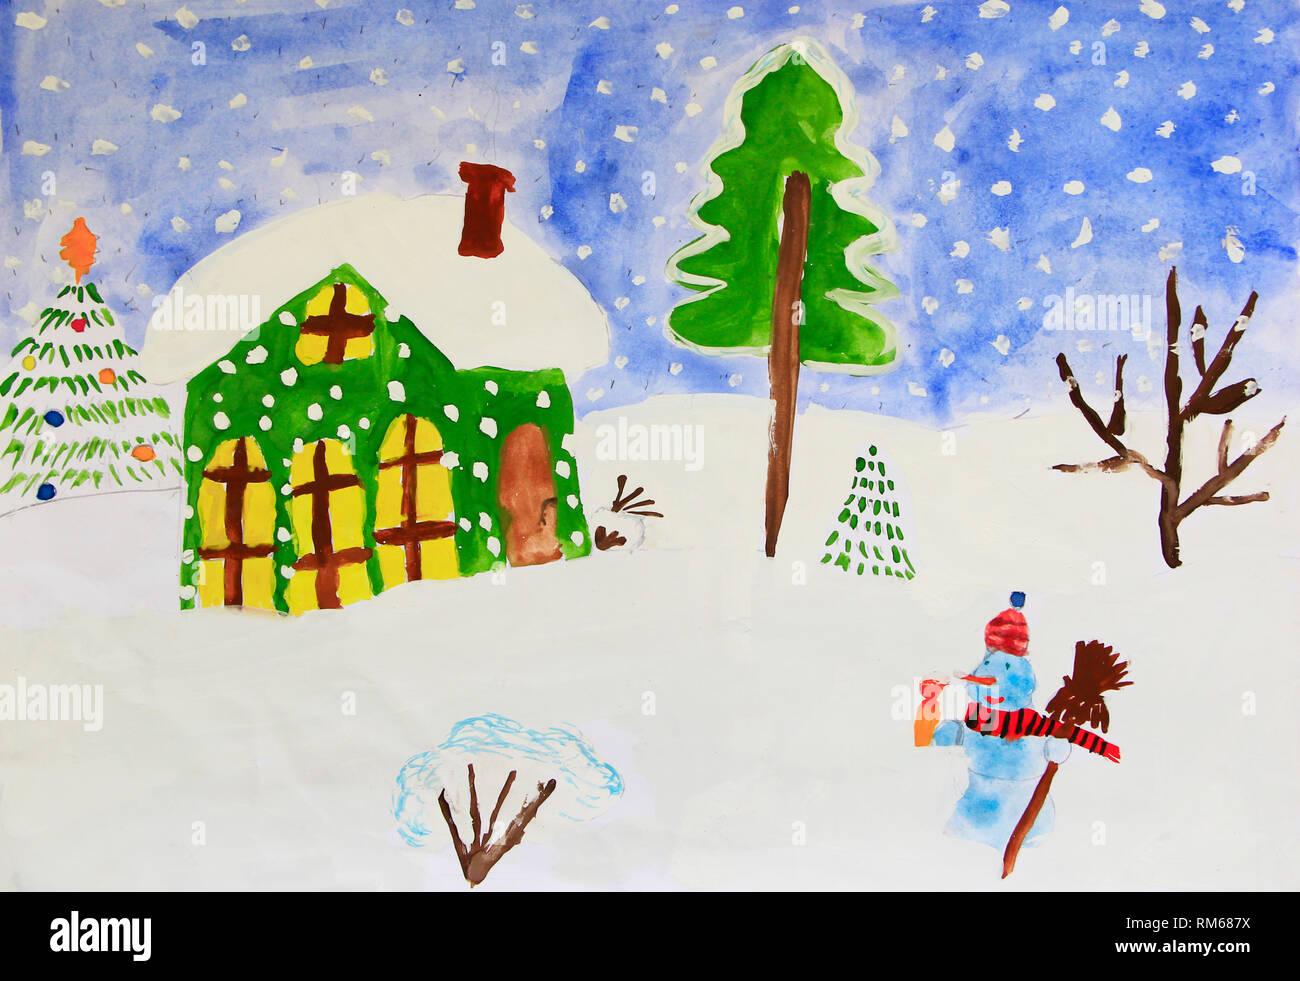 Christmas House Drawing.Christmas Childish Drawing Of Fabulous Snowman And House